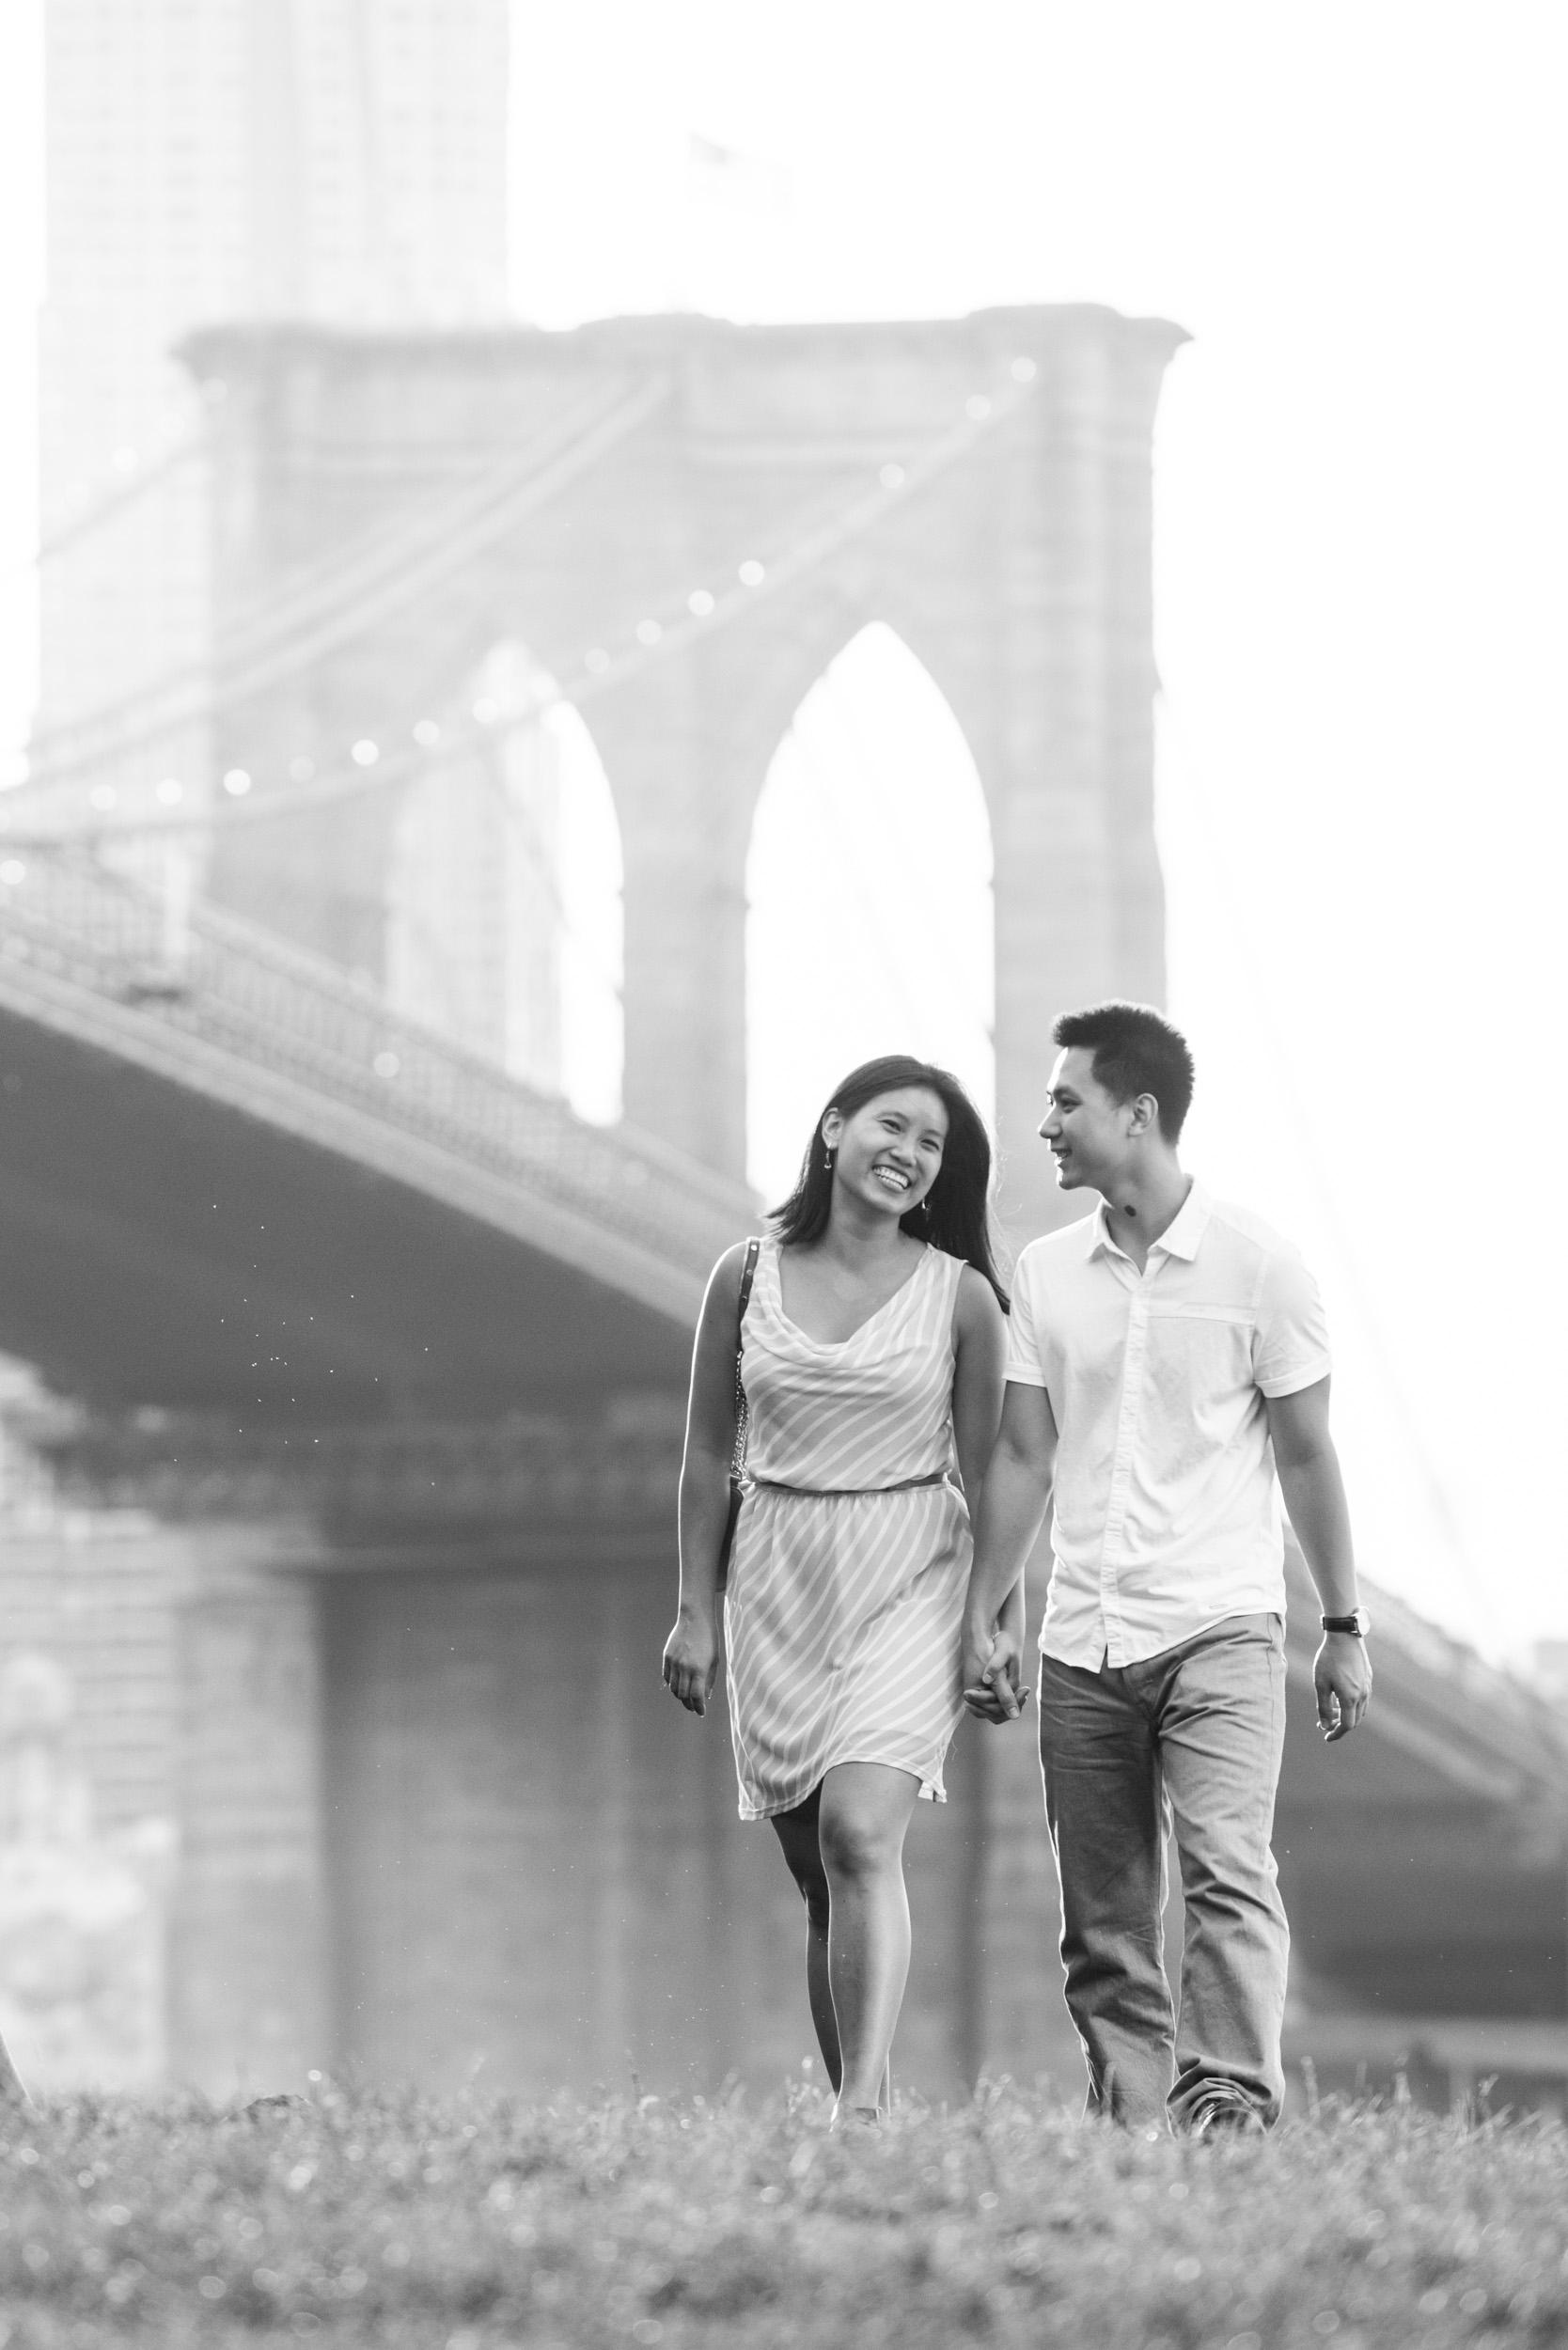 Walking across park 2 - Engagement Portraits - Photo credit Nicola Bailey.jpg